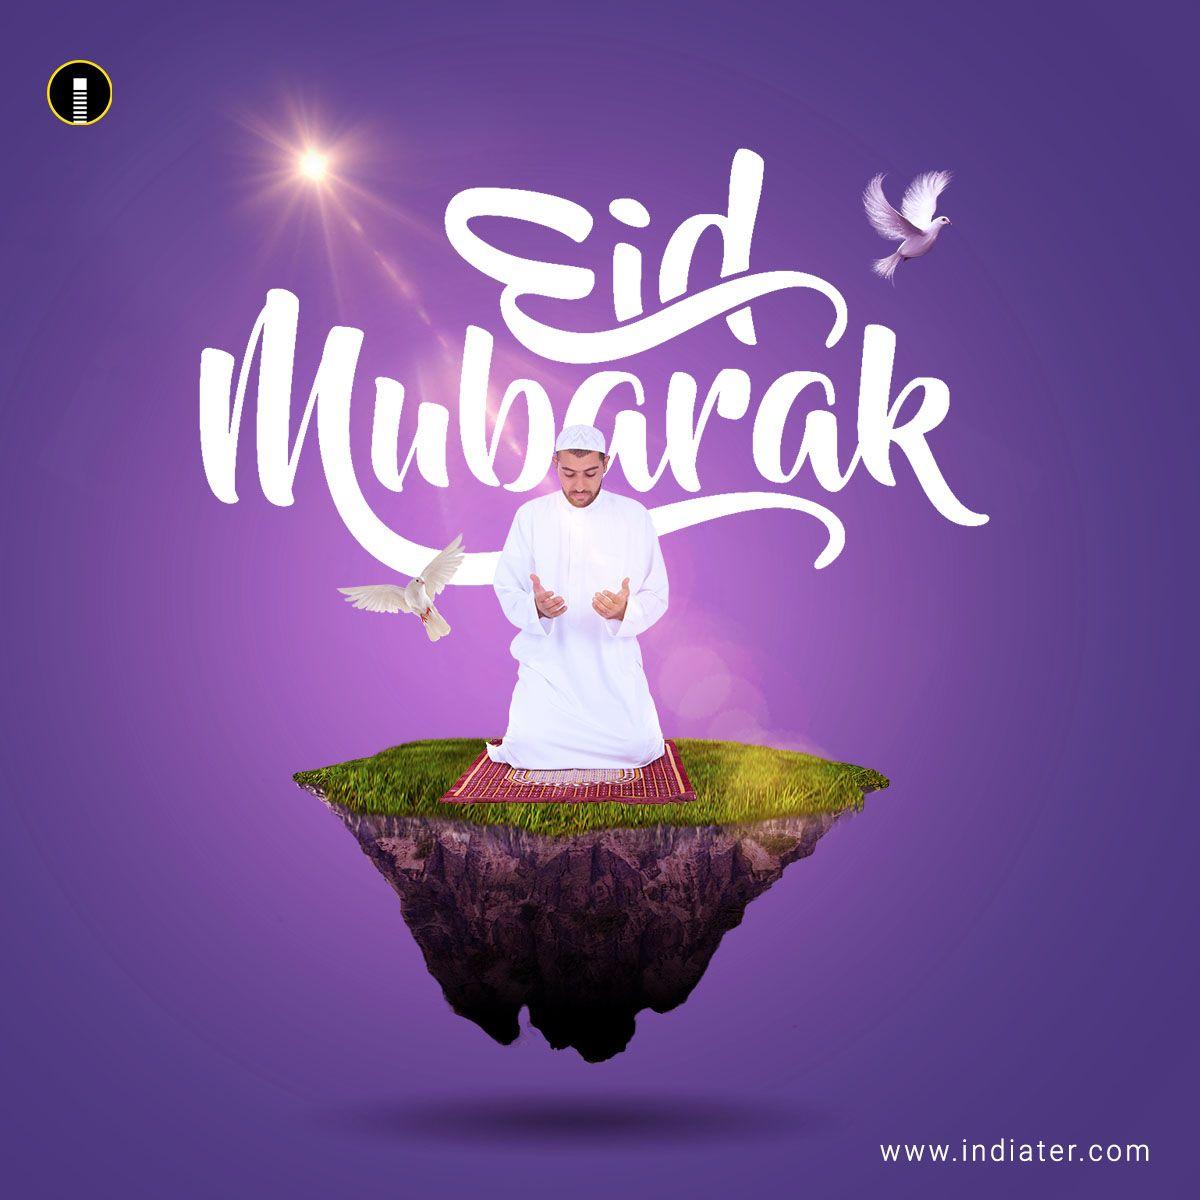 Eid Mubarak Cards Template Free Psd Download Eid Mubarak Card Downloads Template Free